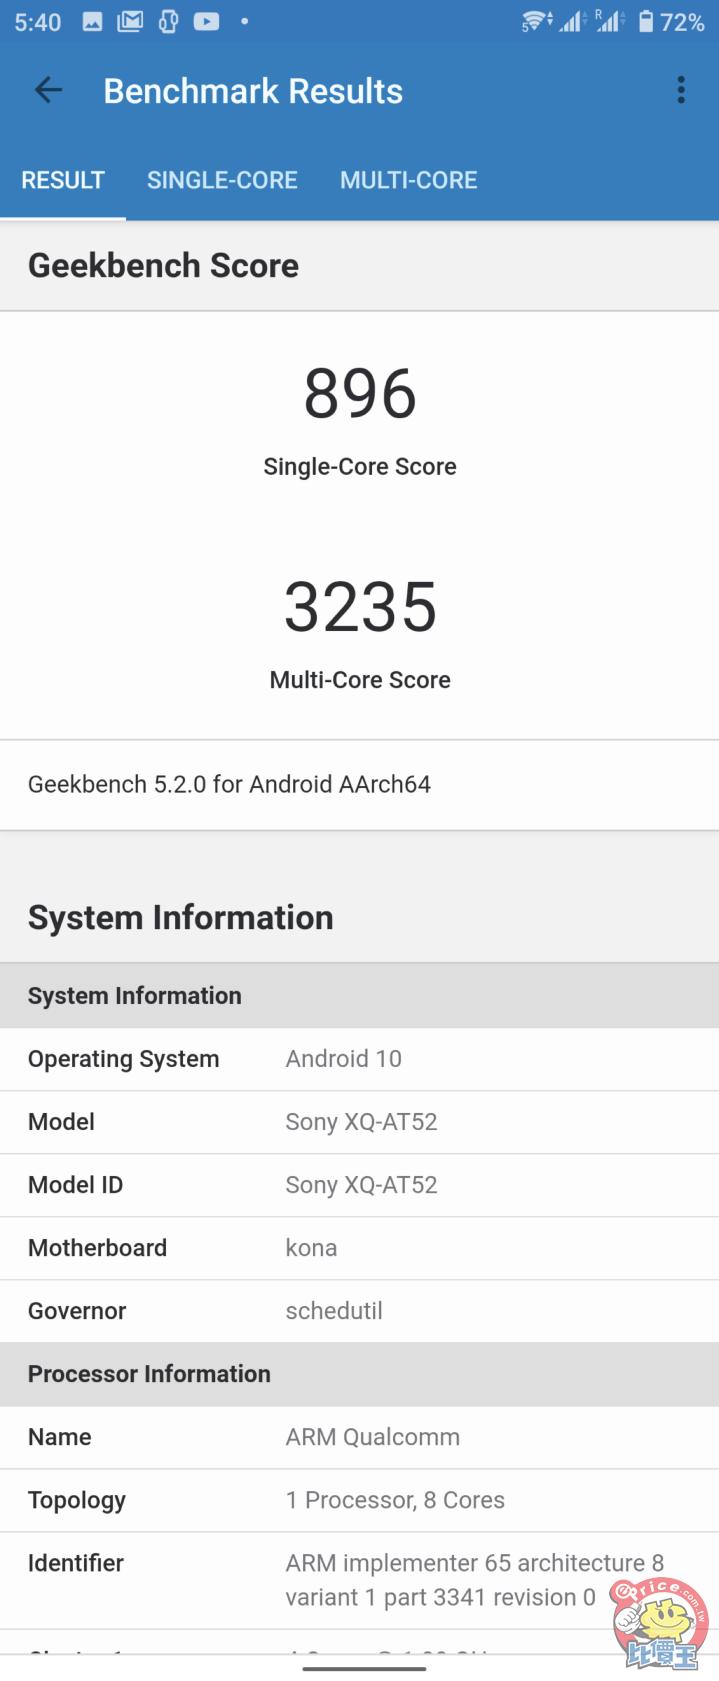 Sony Xperia 1 II 鏡湖綠 升級 RAM 跑分也有提昇